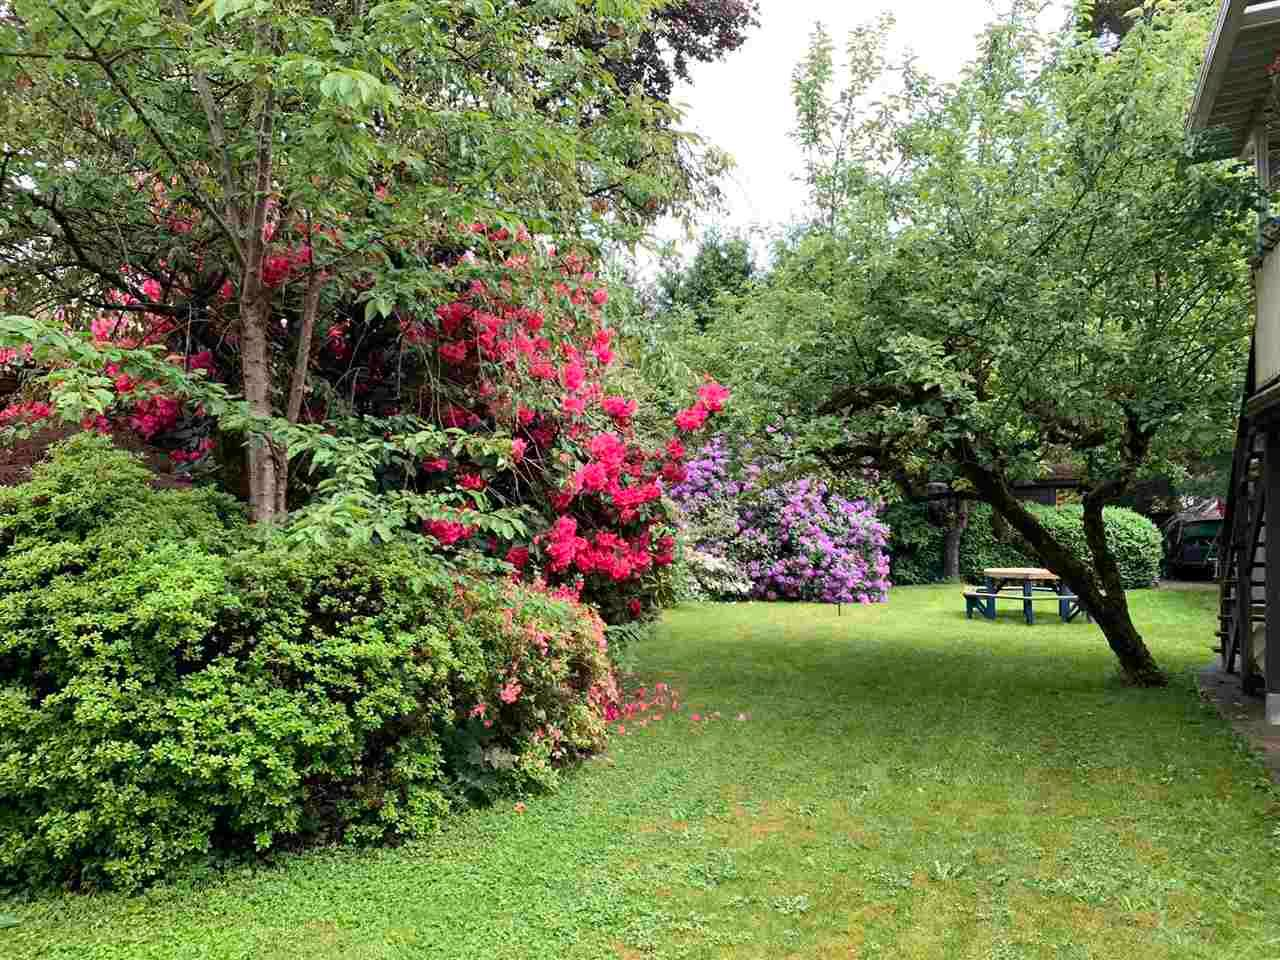 Main Photo: 2876 270B Street in Langley: Aldergrove Langley House for sale : MLS®# R2588166